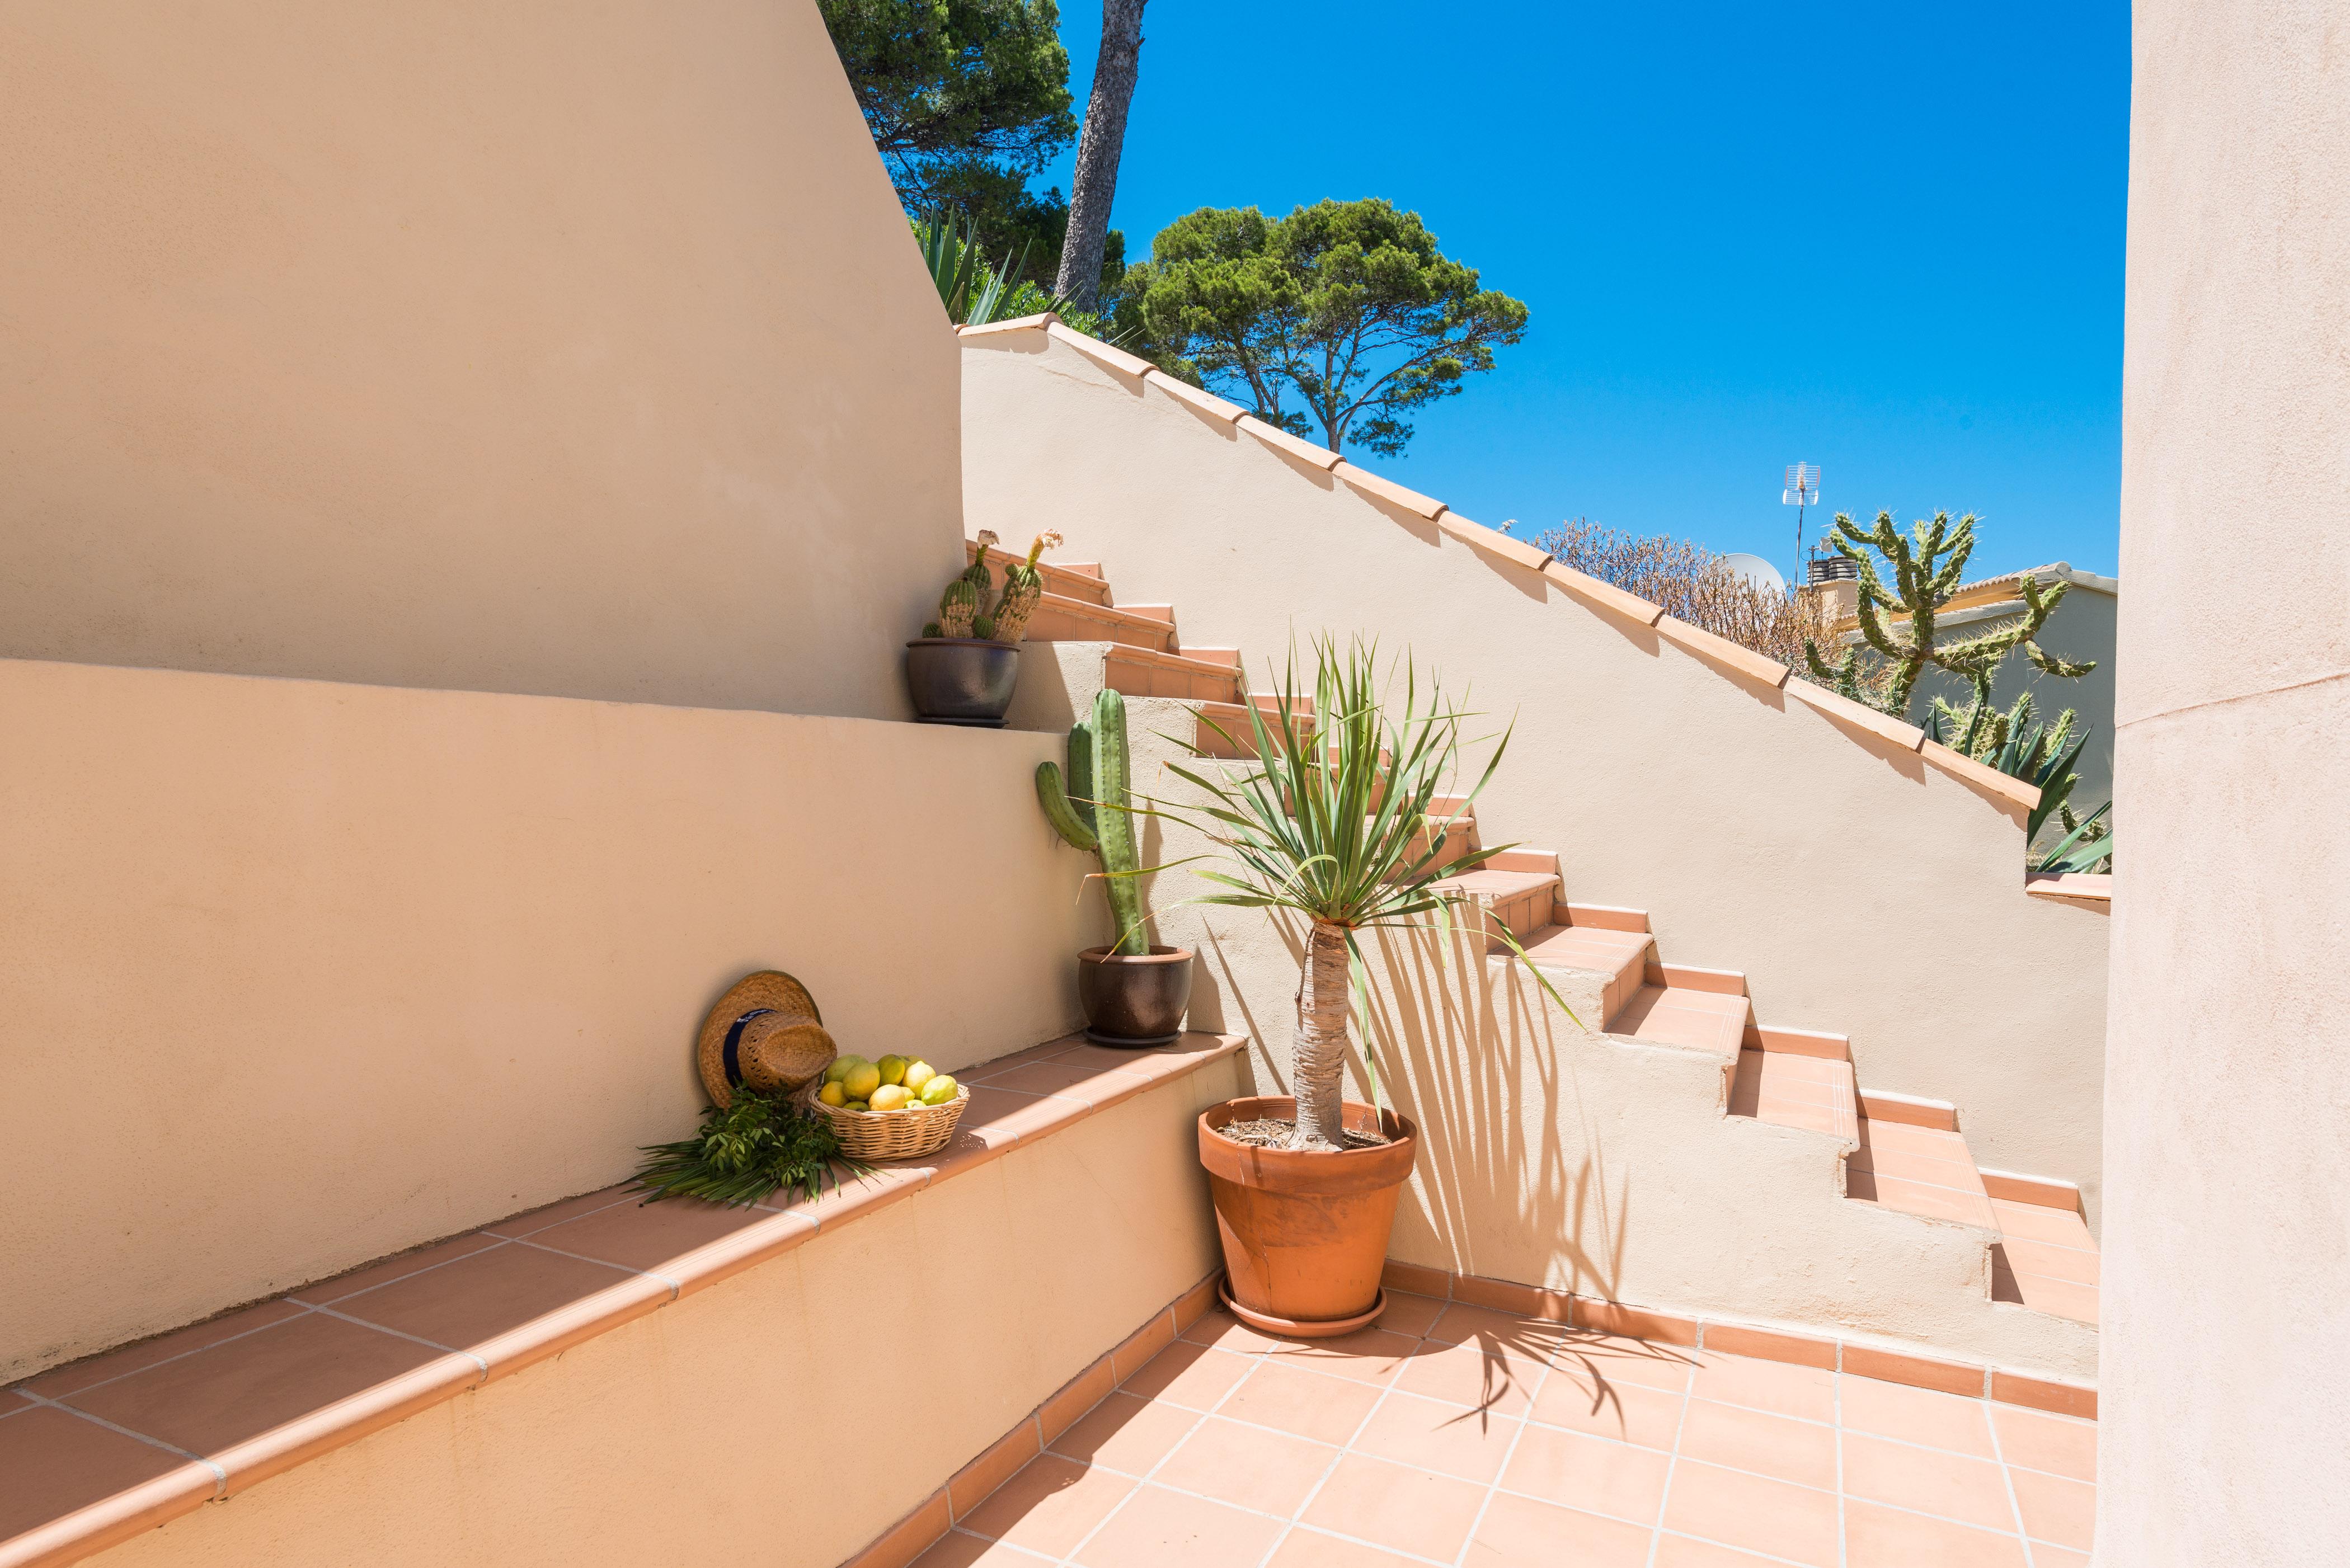 ferienhaus costa de la atalya 6 personen spanien balearen 163475. Black Bedroom Furniture Sets. Home Design Ideas